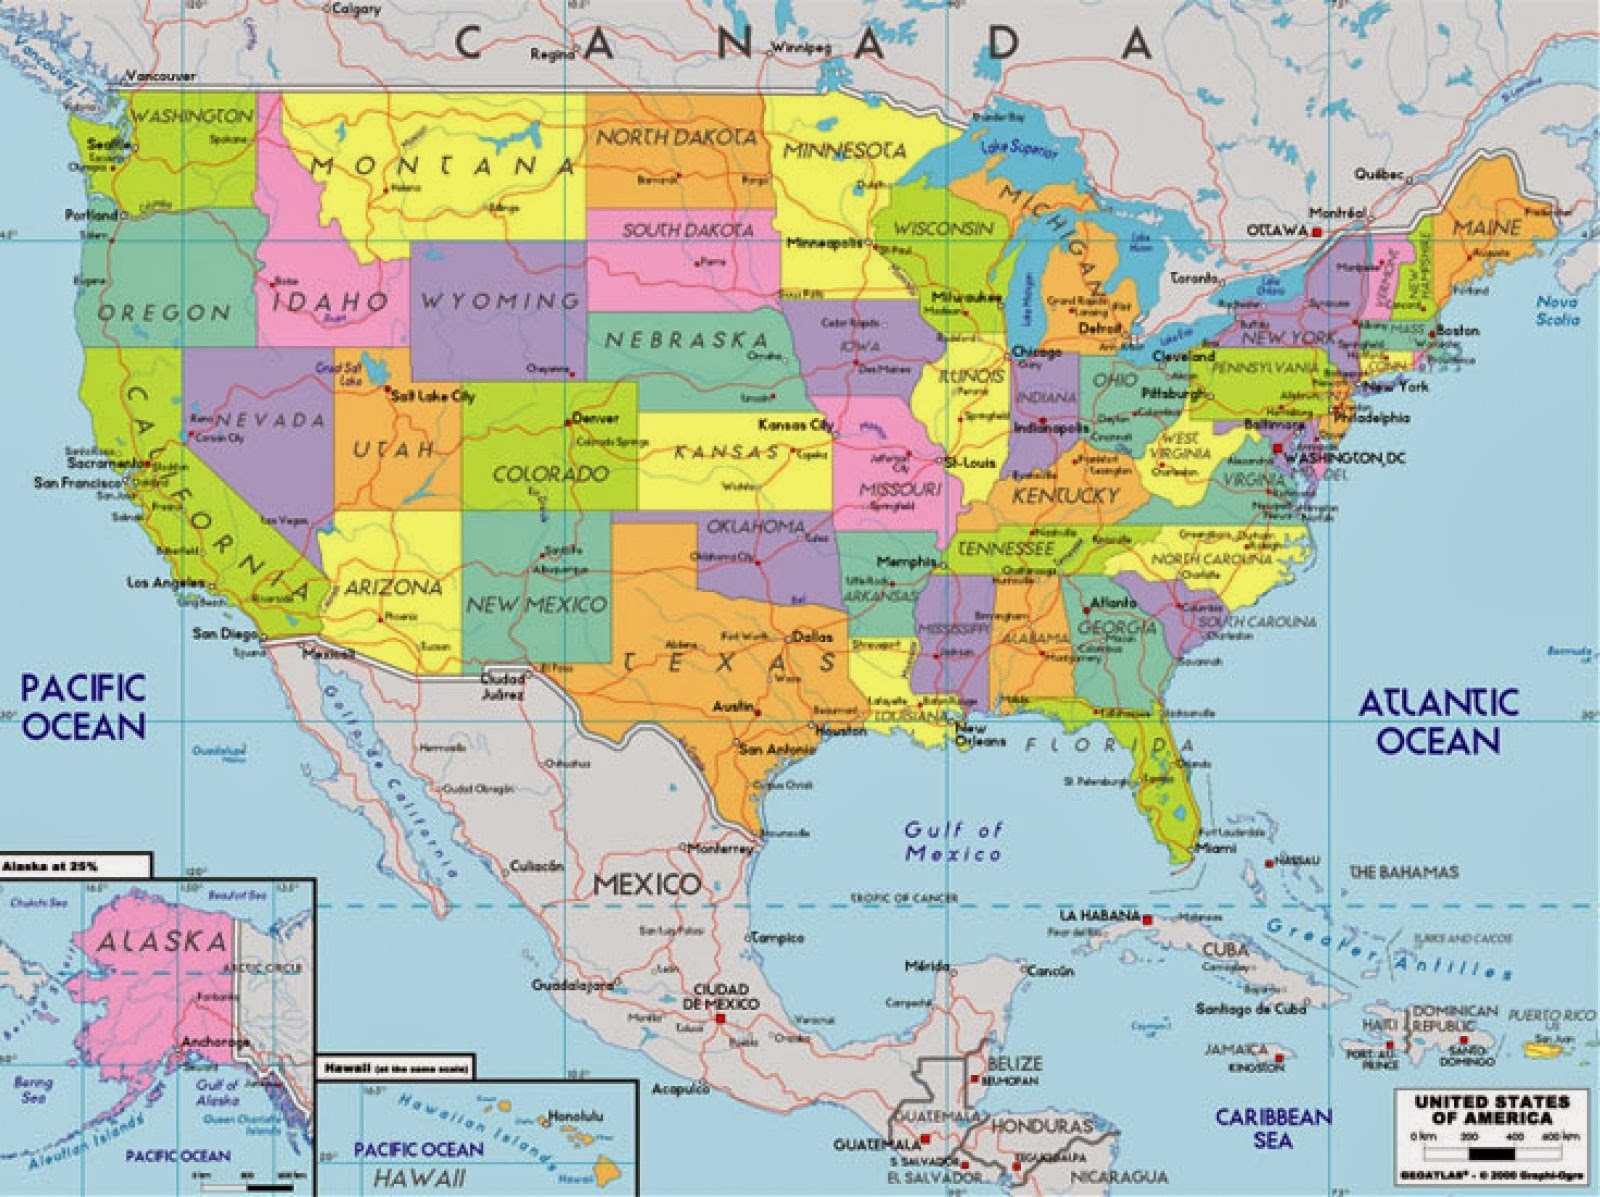 Mapa Completo De Usa - Mapa florida usa